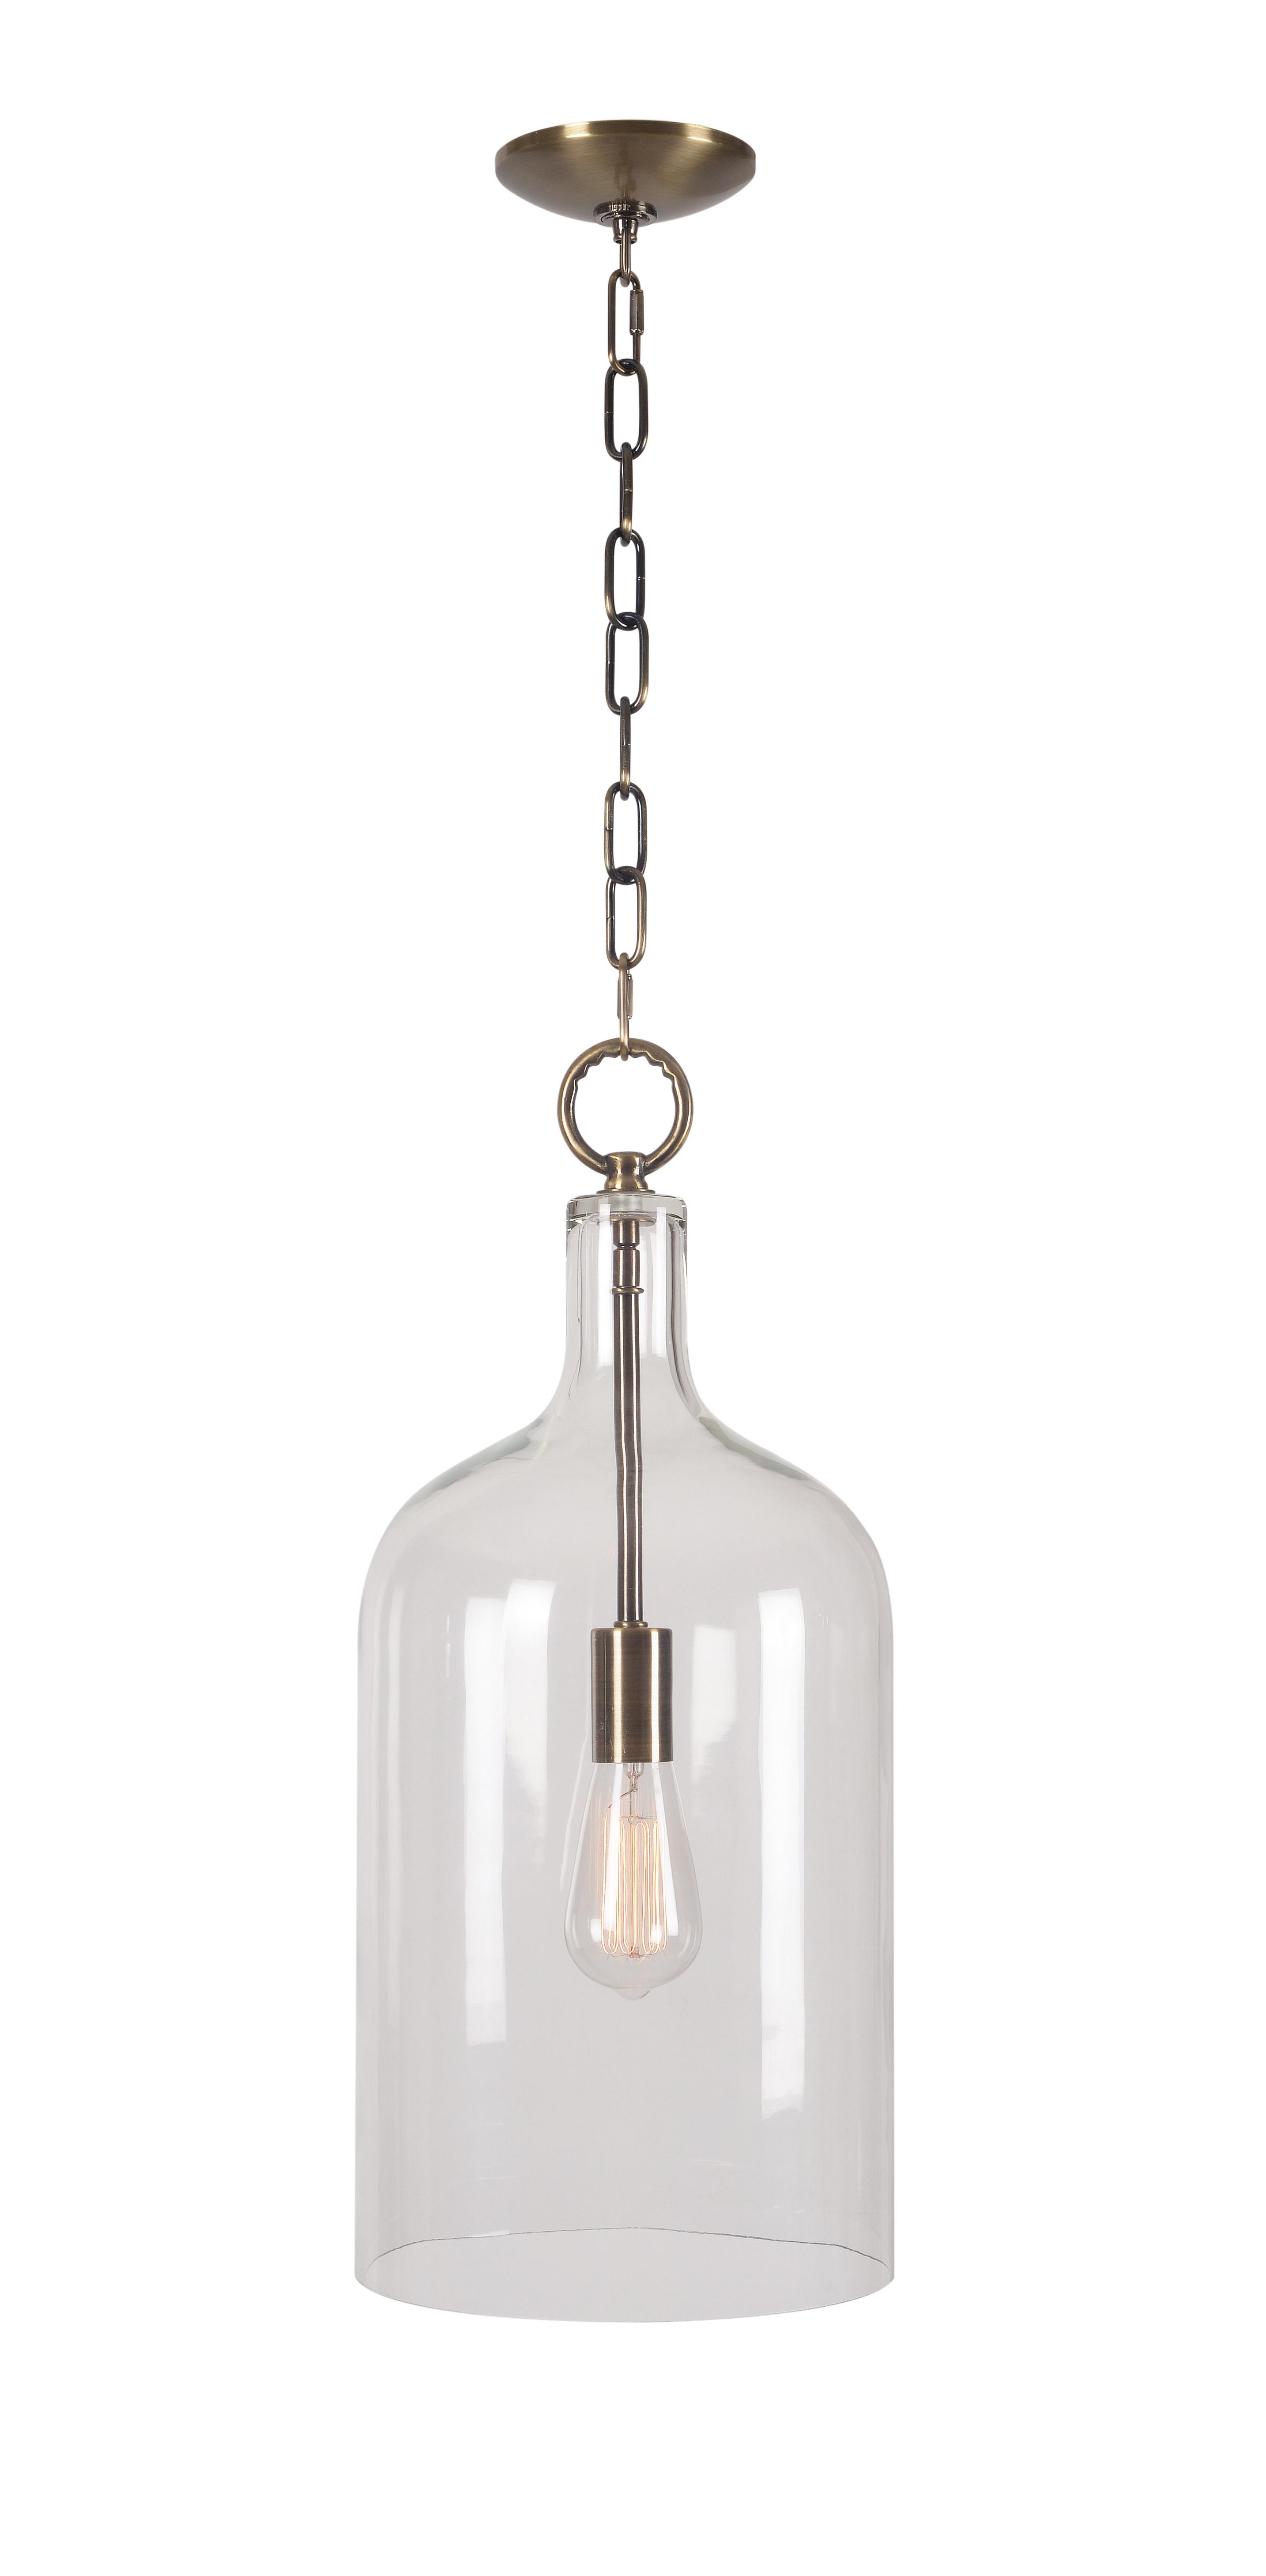 Favorite Giacinta 1 Light Single Bell Pendants Throughout Clematite 1 Light Single Jar Pendant (View 7 of 25)